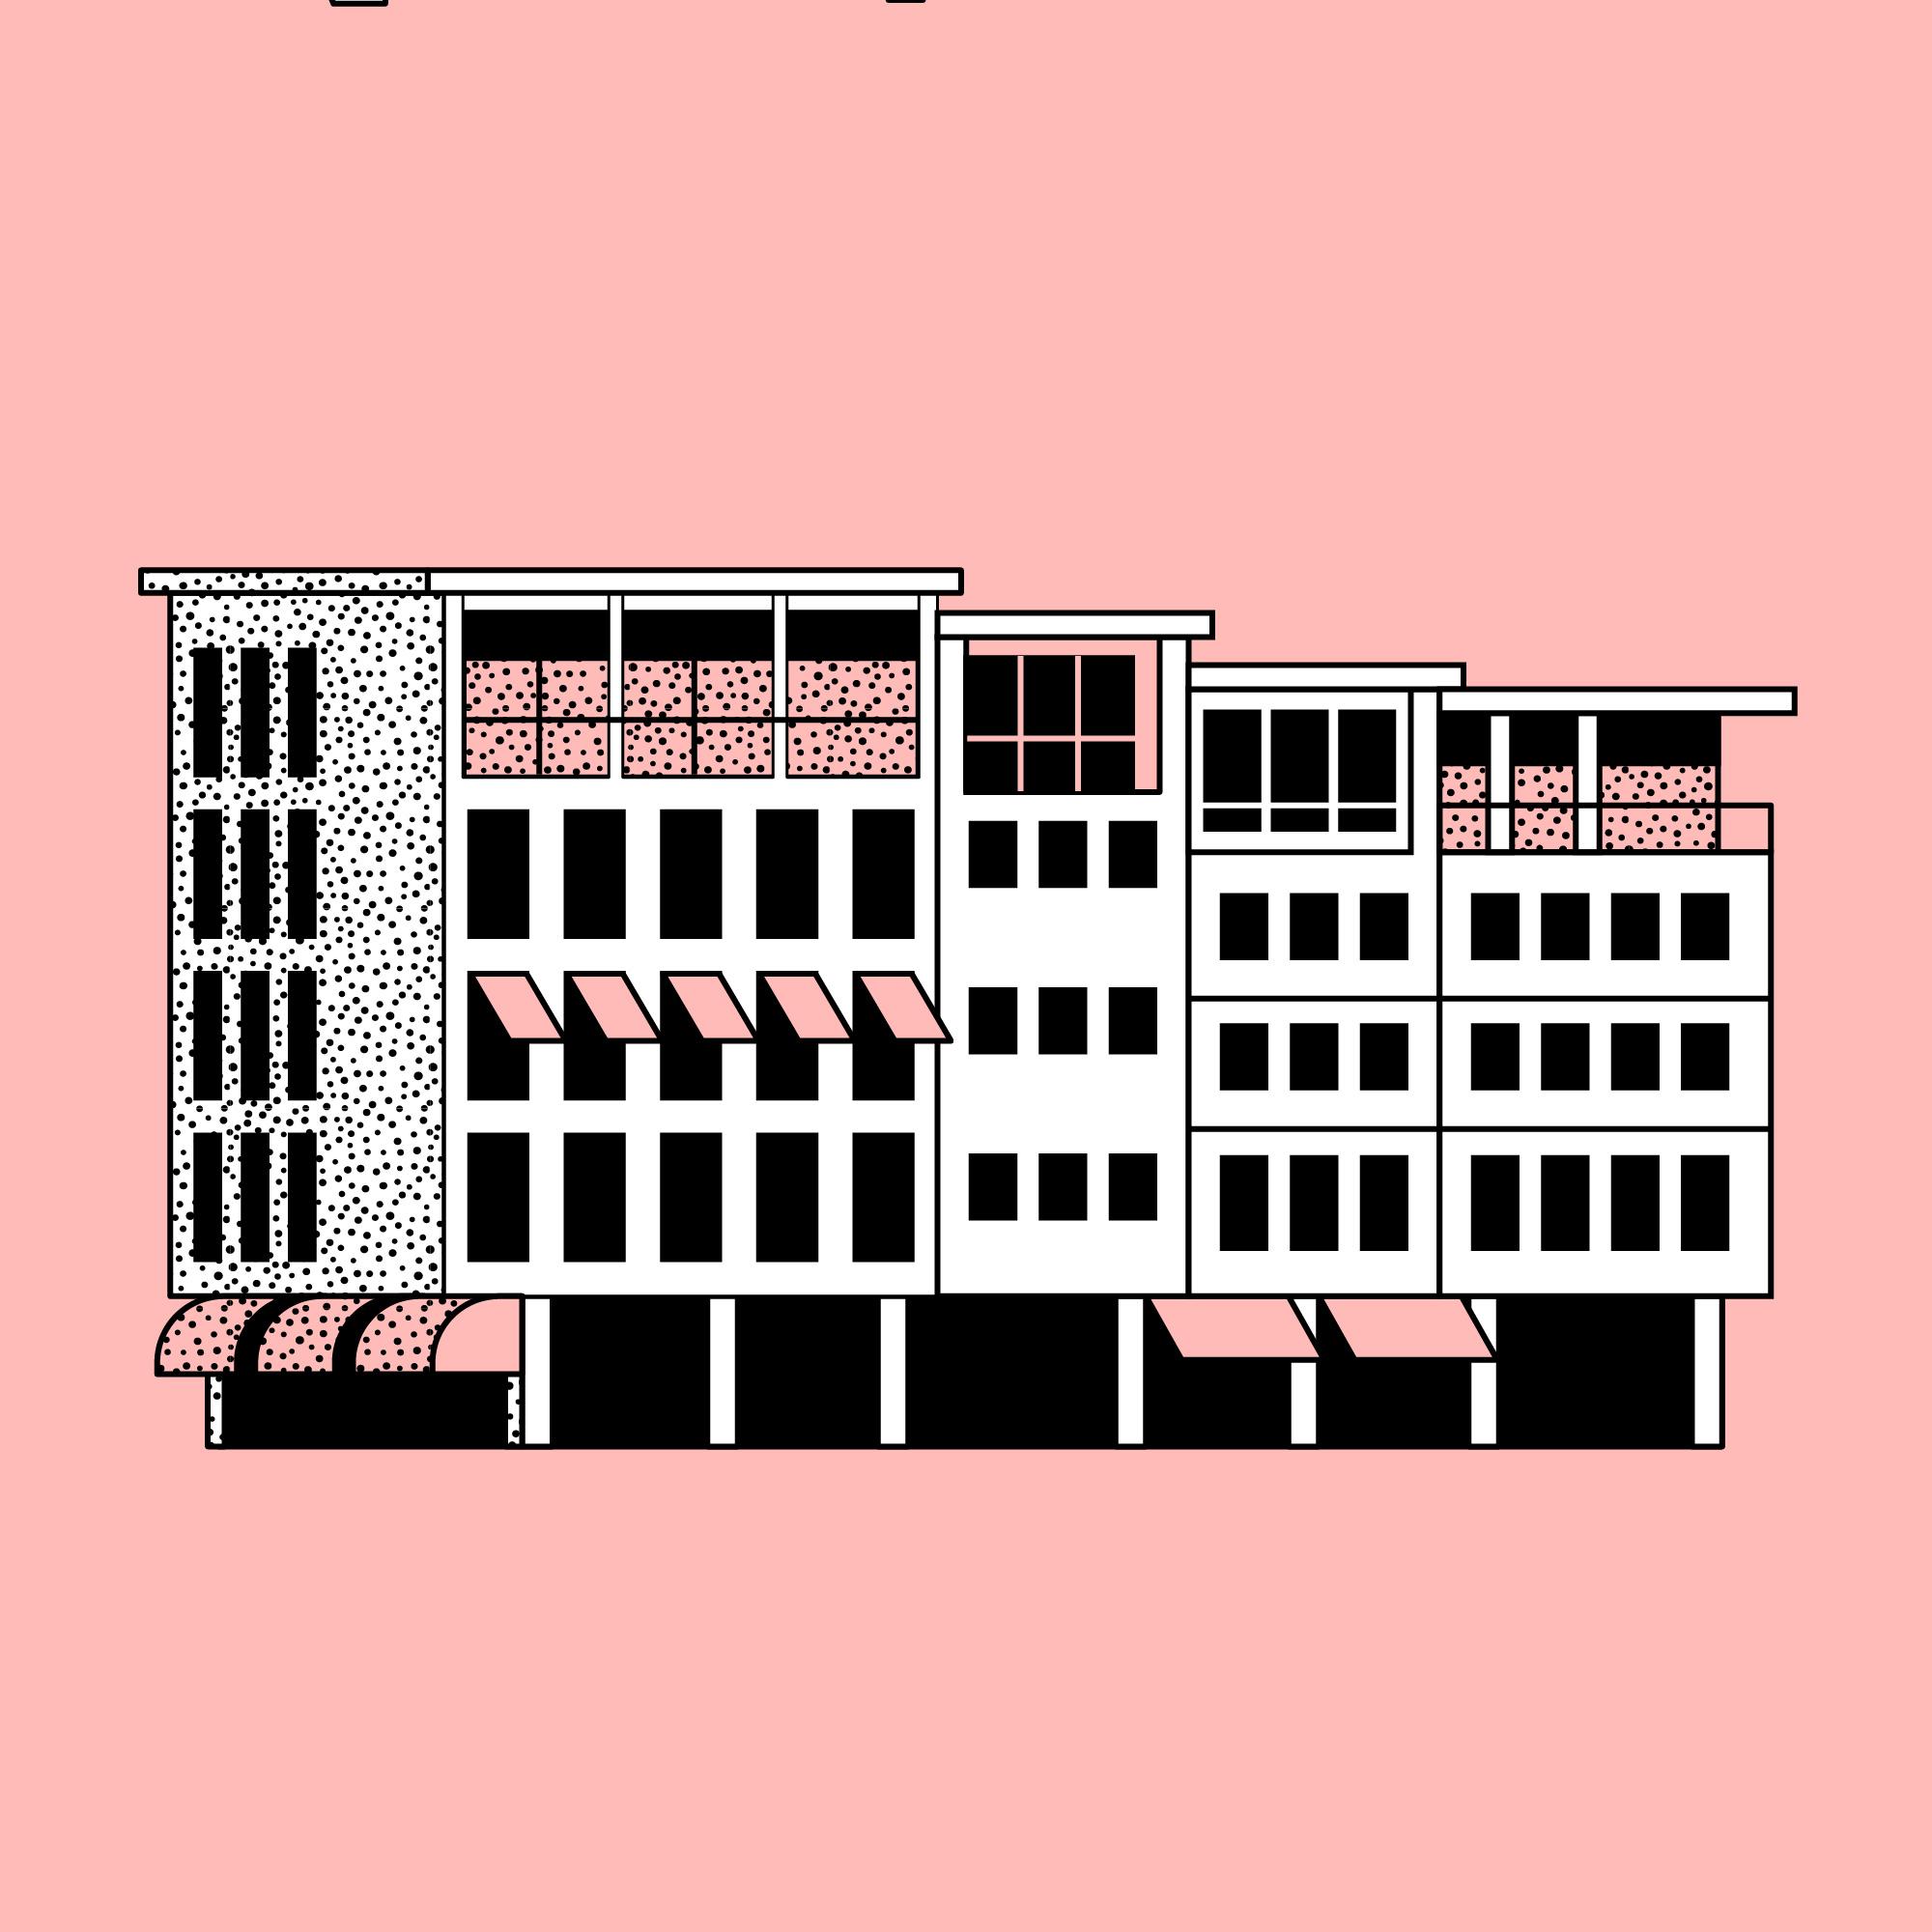 Titel: Urban structures: Mid-century modern town square, Stuttgart, Germany